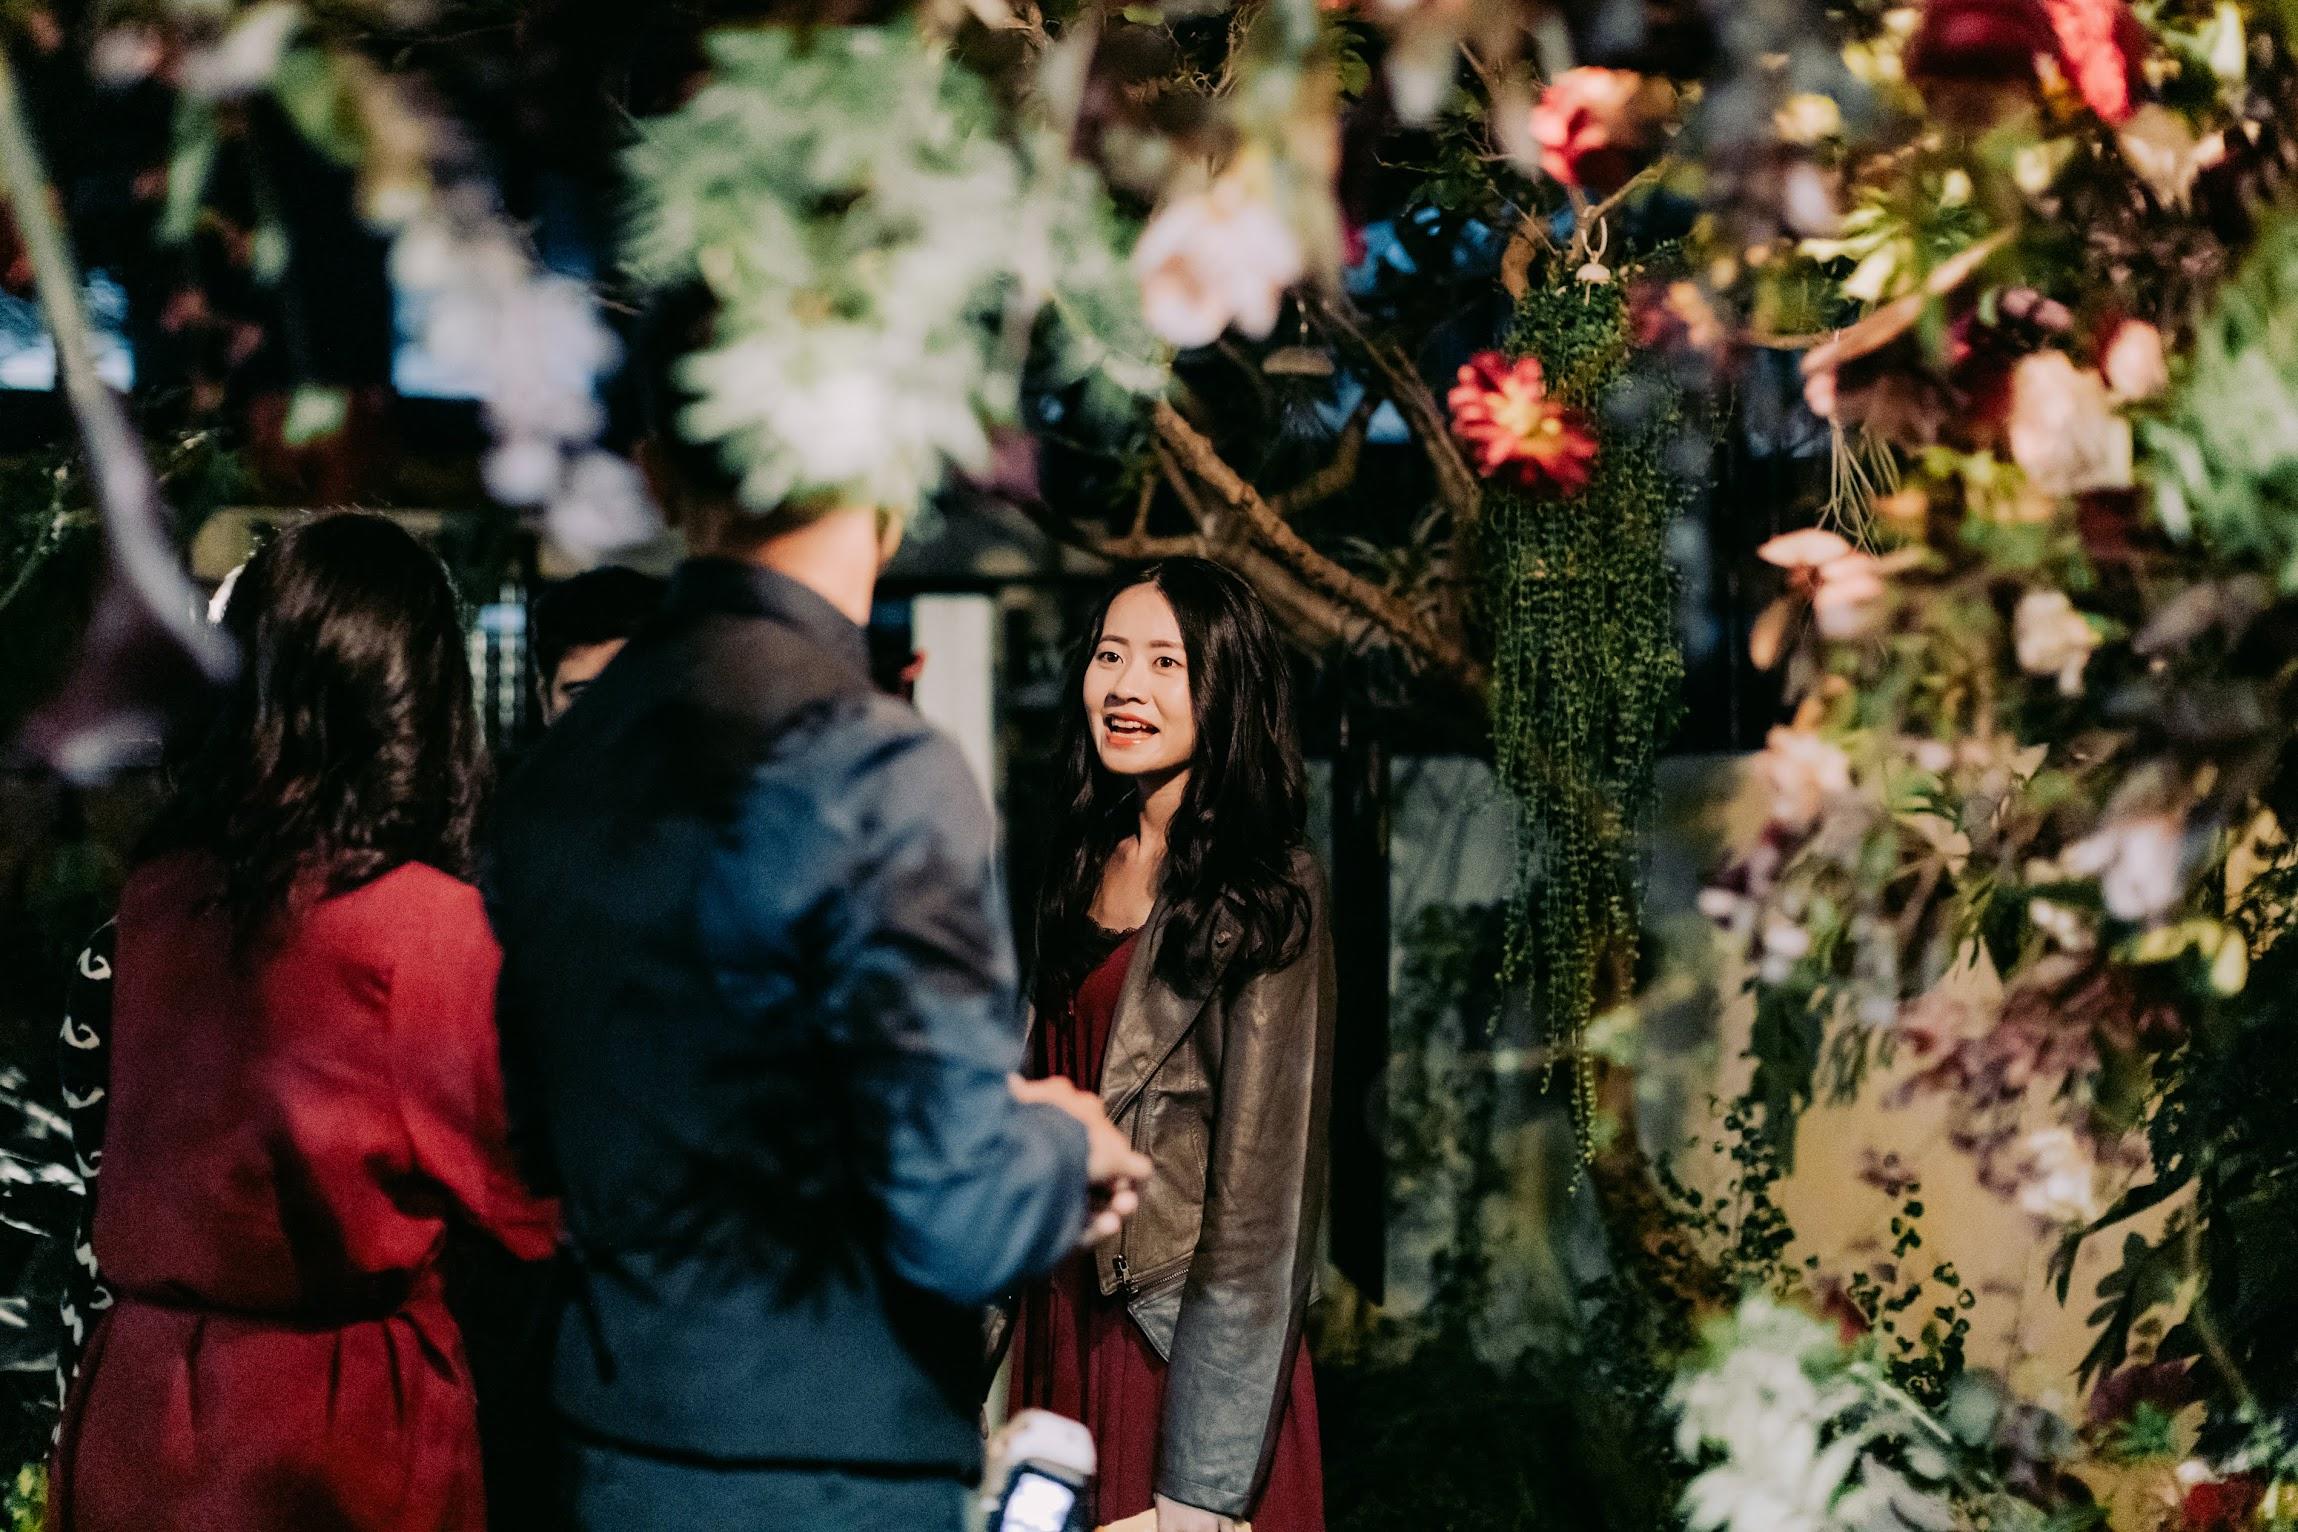 Jifs 婚禮,Amazing Grace攝影,美式婚禮派對,小型婚禮,Wedding Party